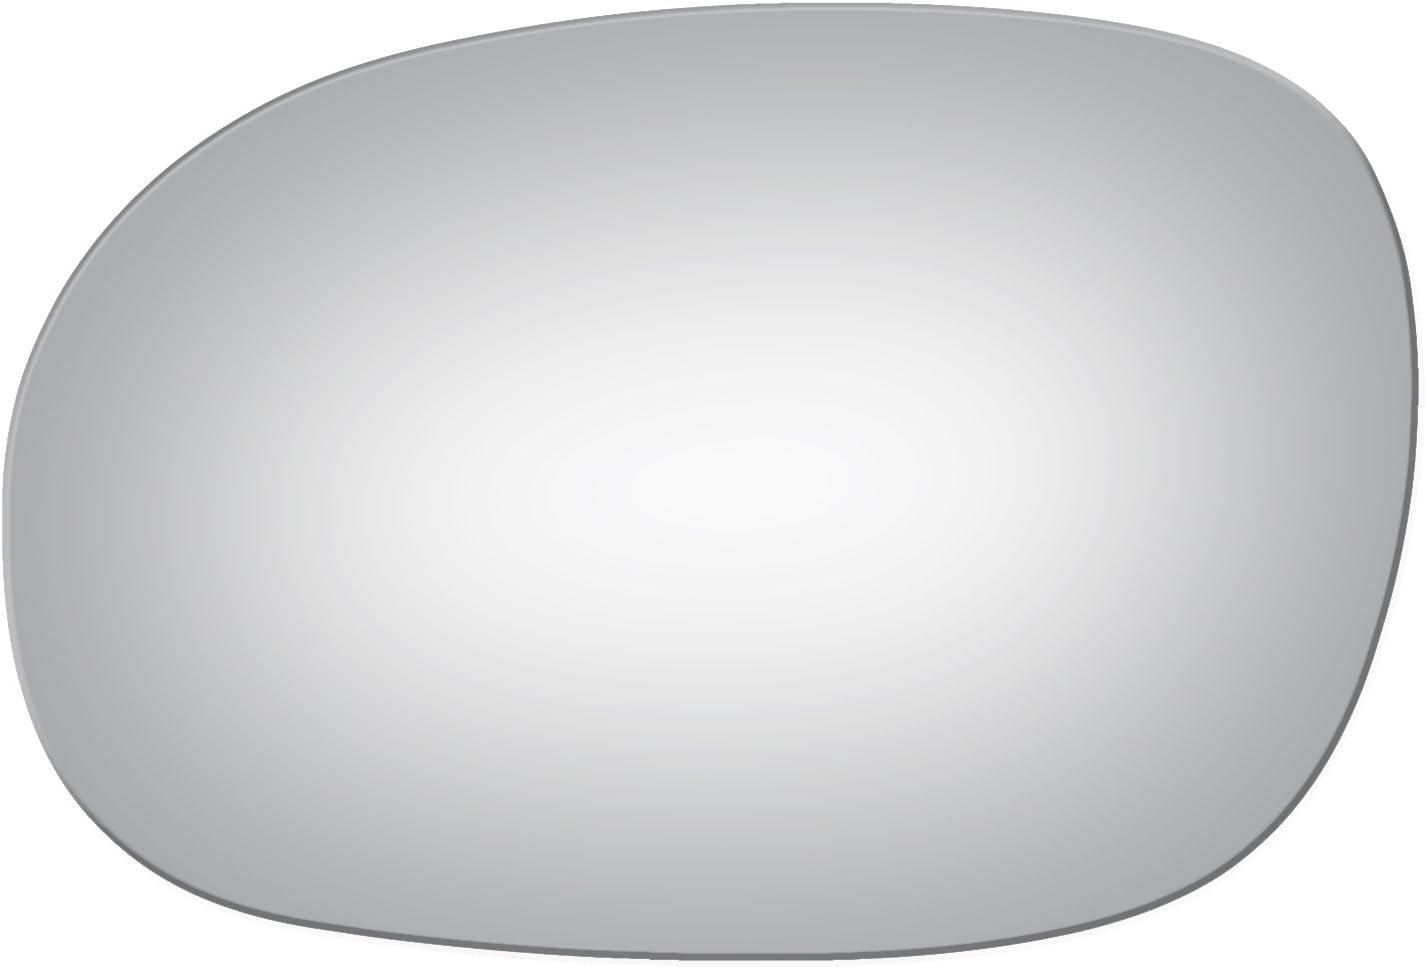 Burco Driver /& Passenger Mirror Glass for Neon Neon